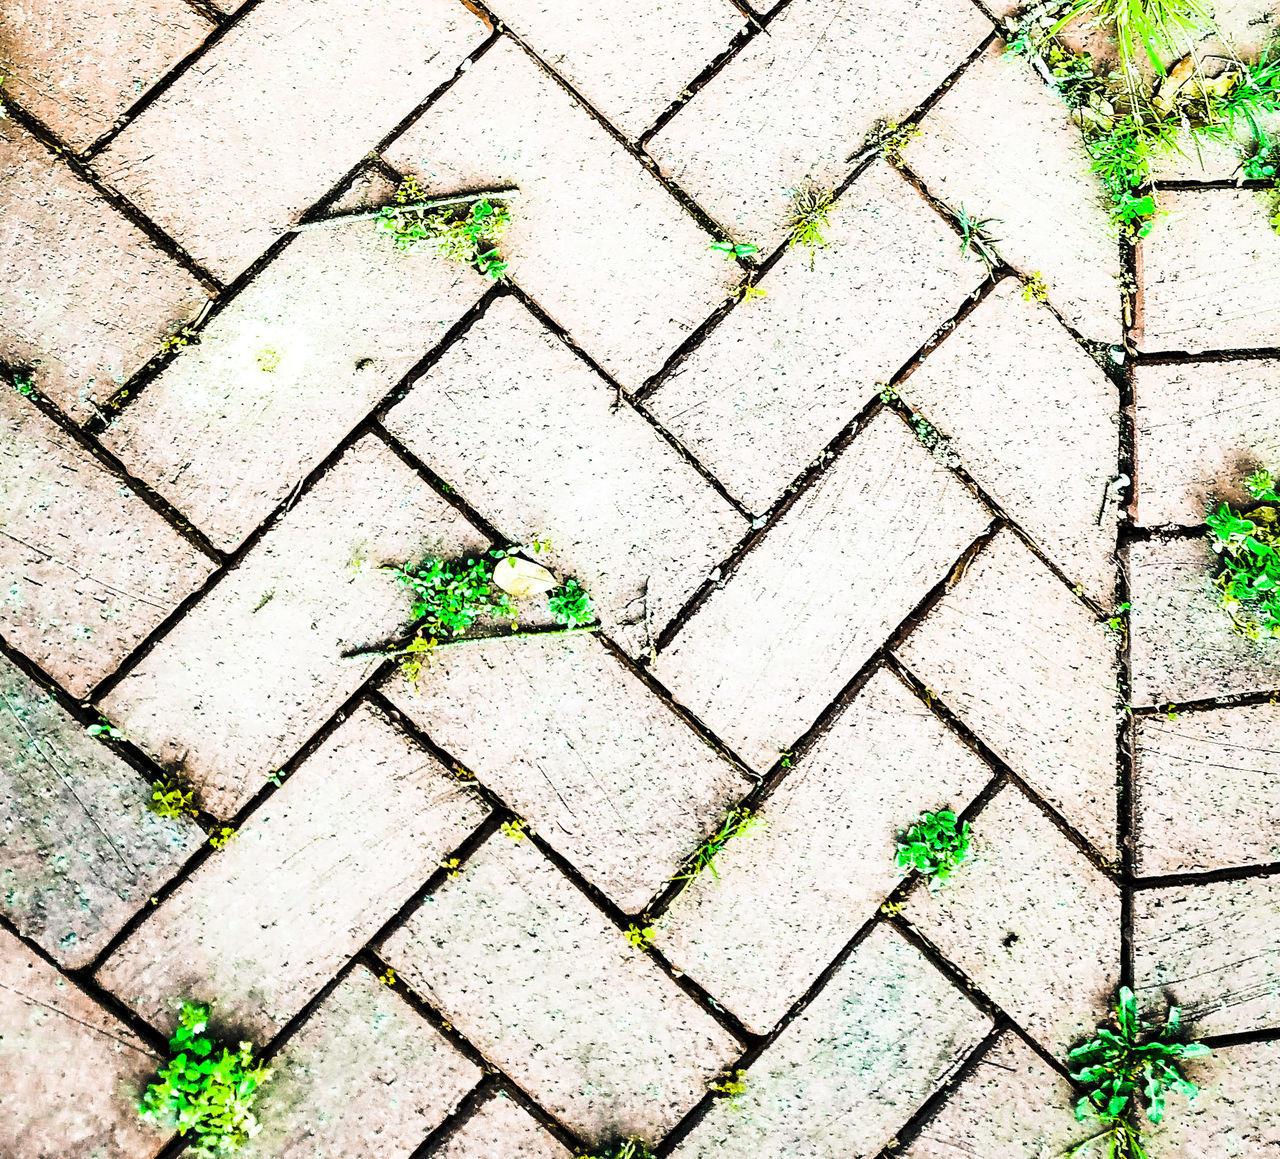 Picture of a brick walkway beneath me. Bricks Walkway Just Clicking Beneath My Feet Weeds In The Cracks EyeEmNewHere